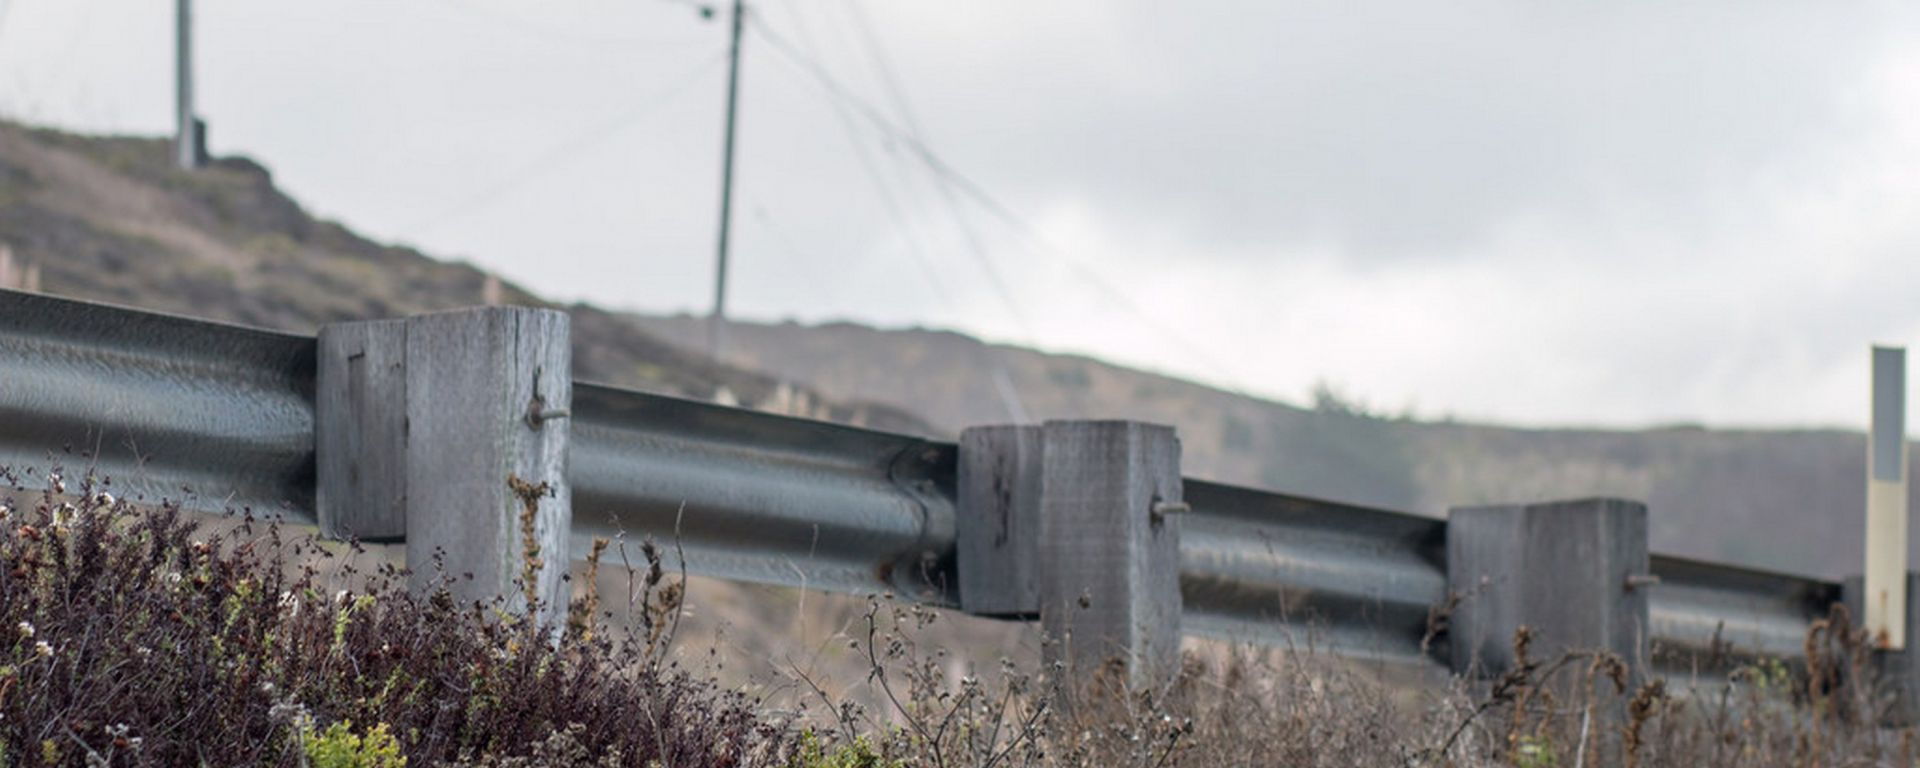 Anas: arrivano 200 km di guardrail sicuri